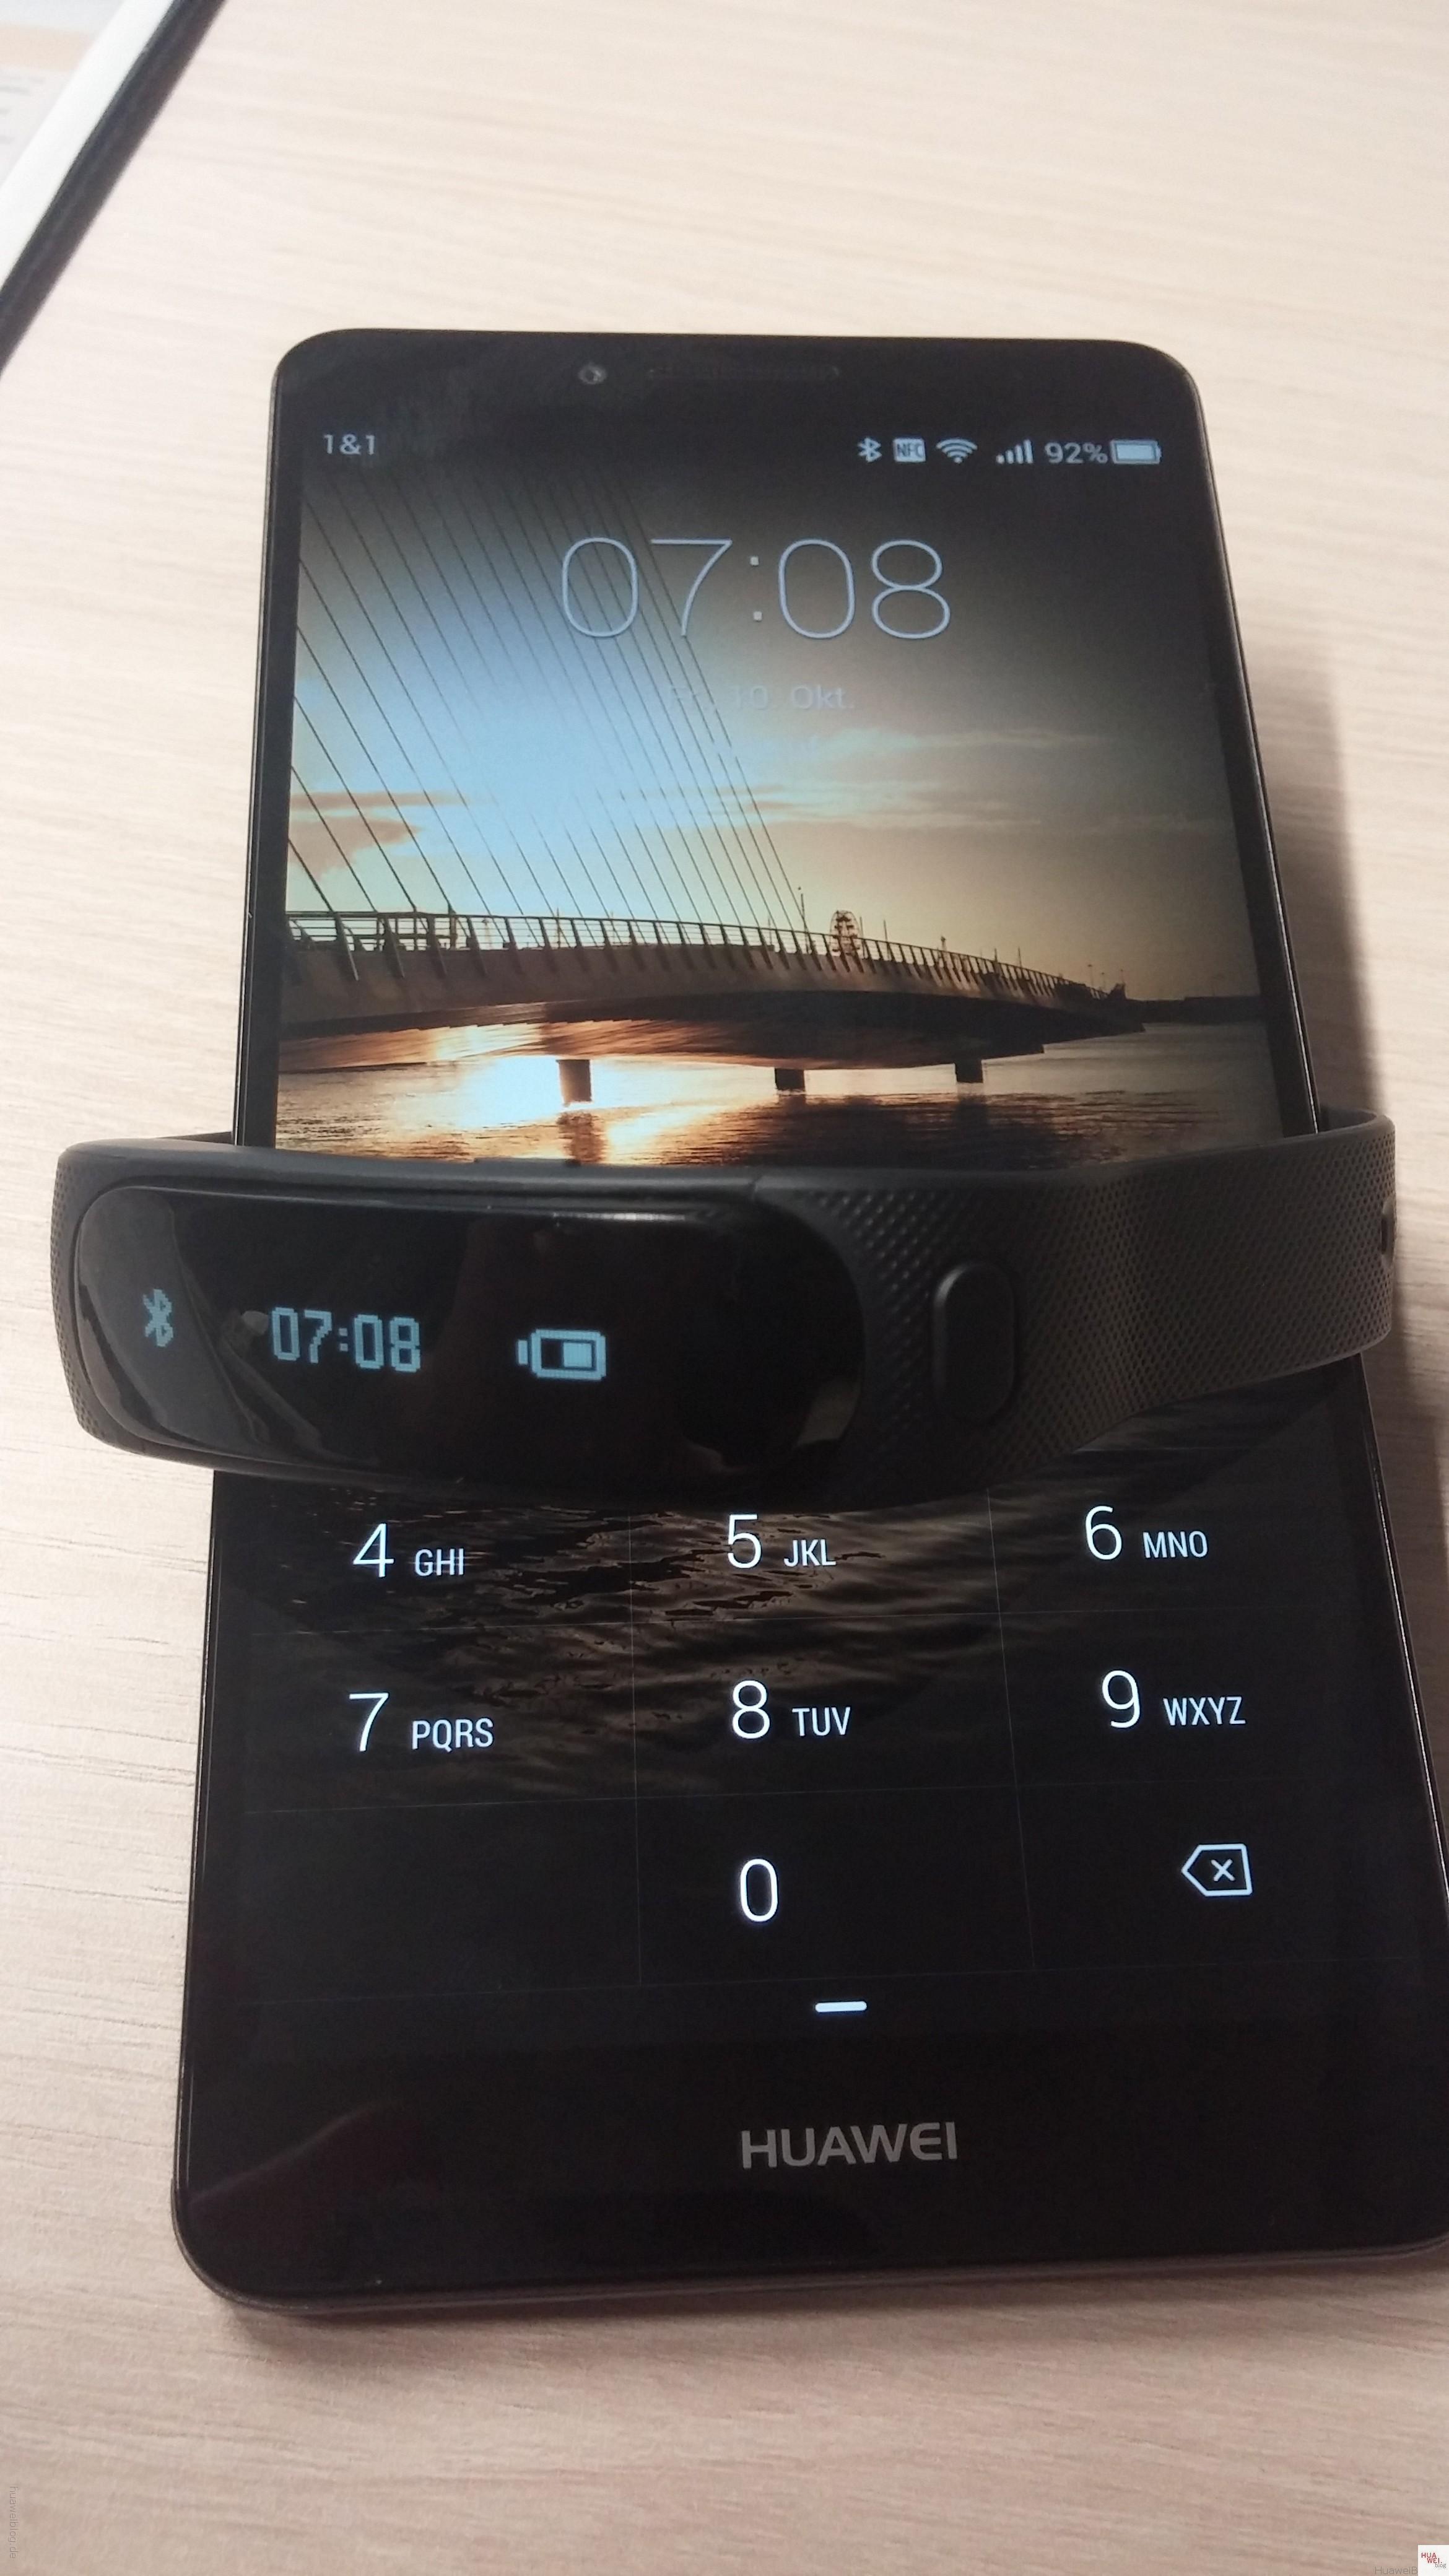 Huawei_Mate7_TalkbandB1